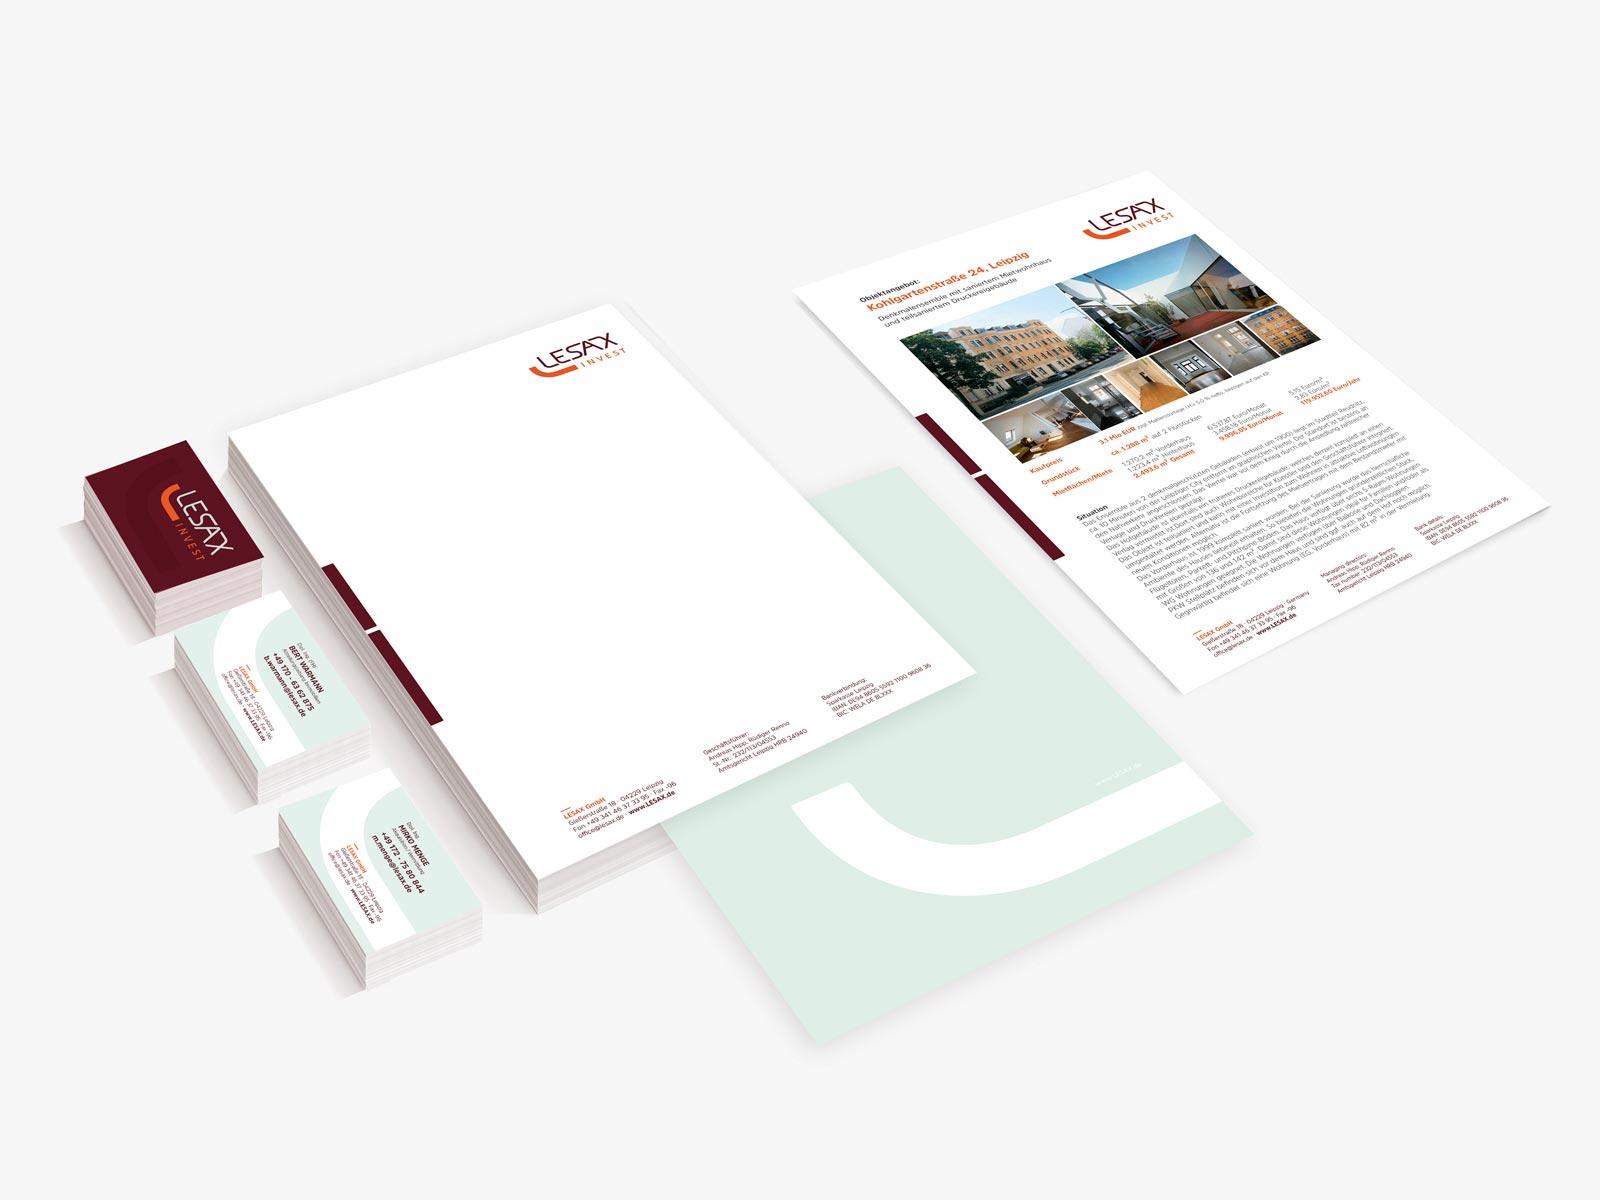 kathrin, krasselt, mediendesign, grafik, grafiker, leipzig, werbung, webdesign, logo, corporate, design, immobilien